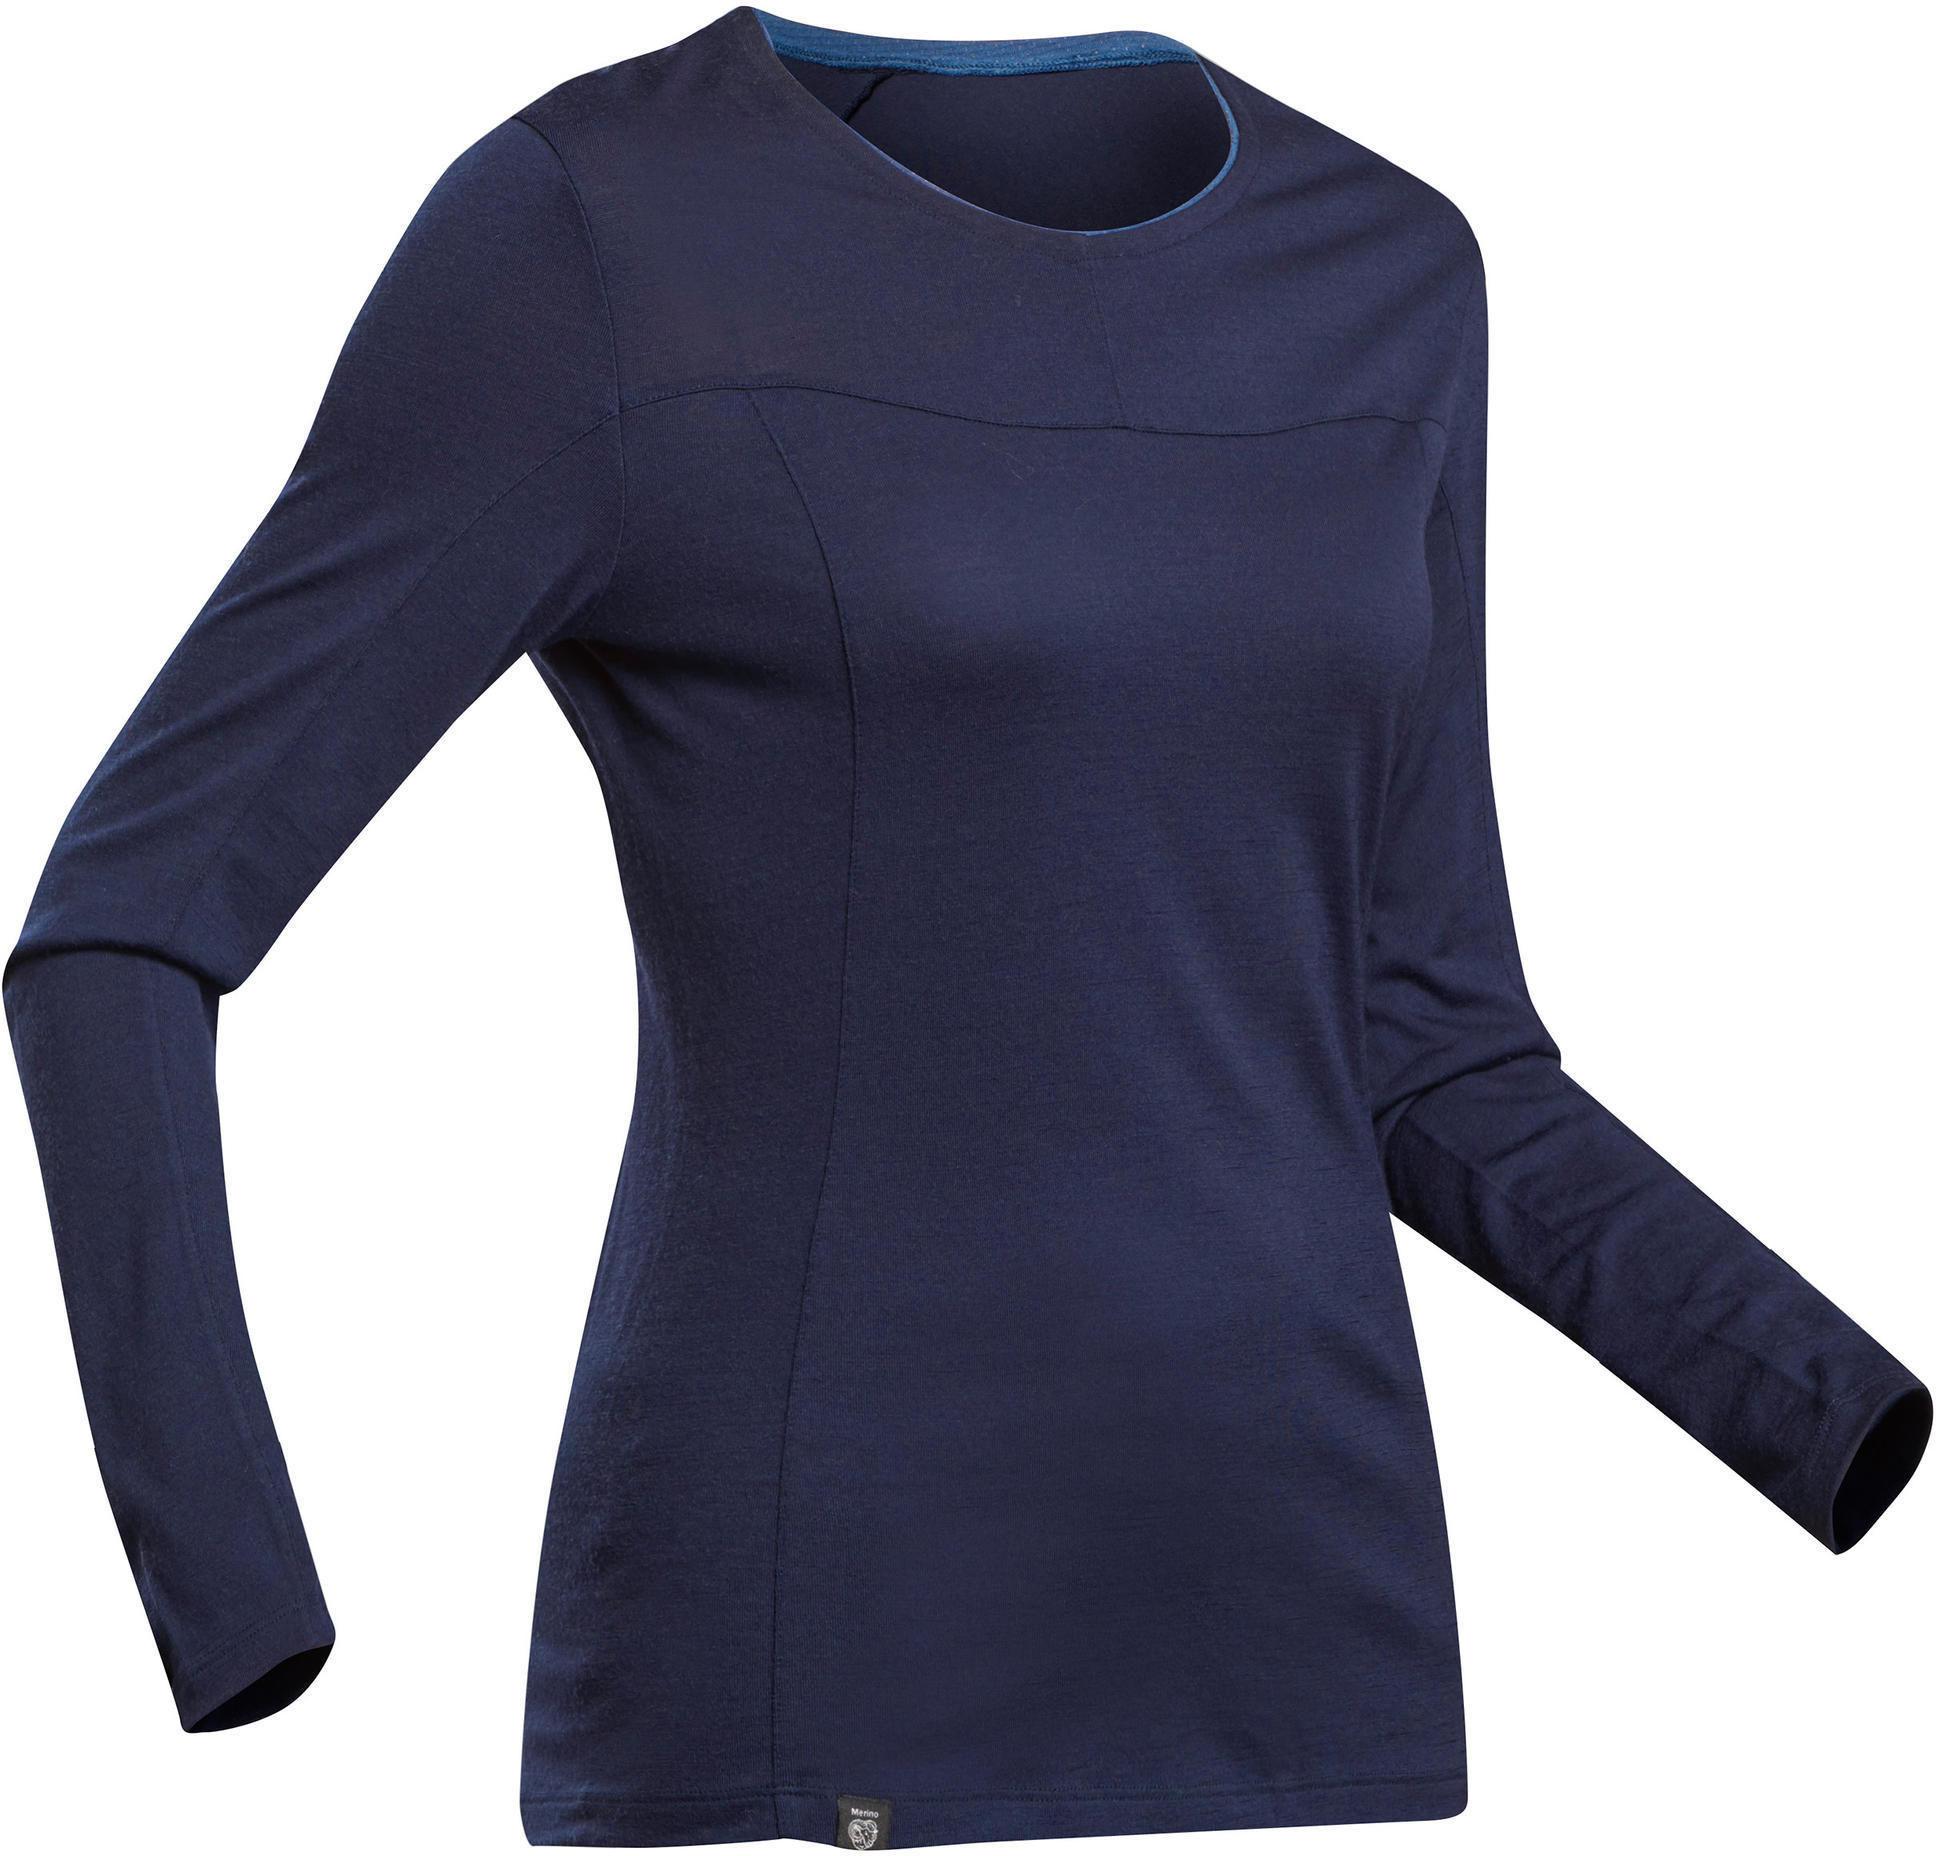 Koszulka trekkingowa z długim rękawem - TREK 500 MERINO - damska